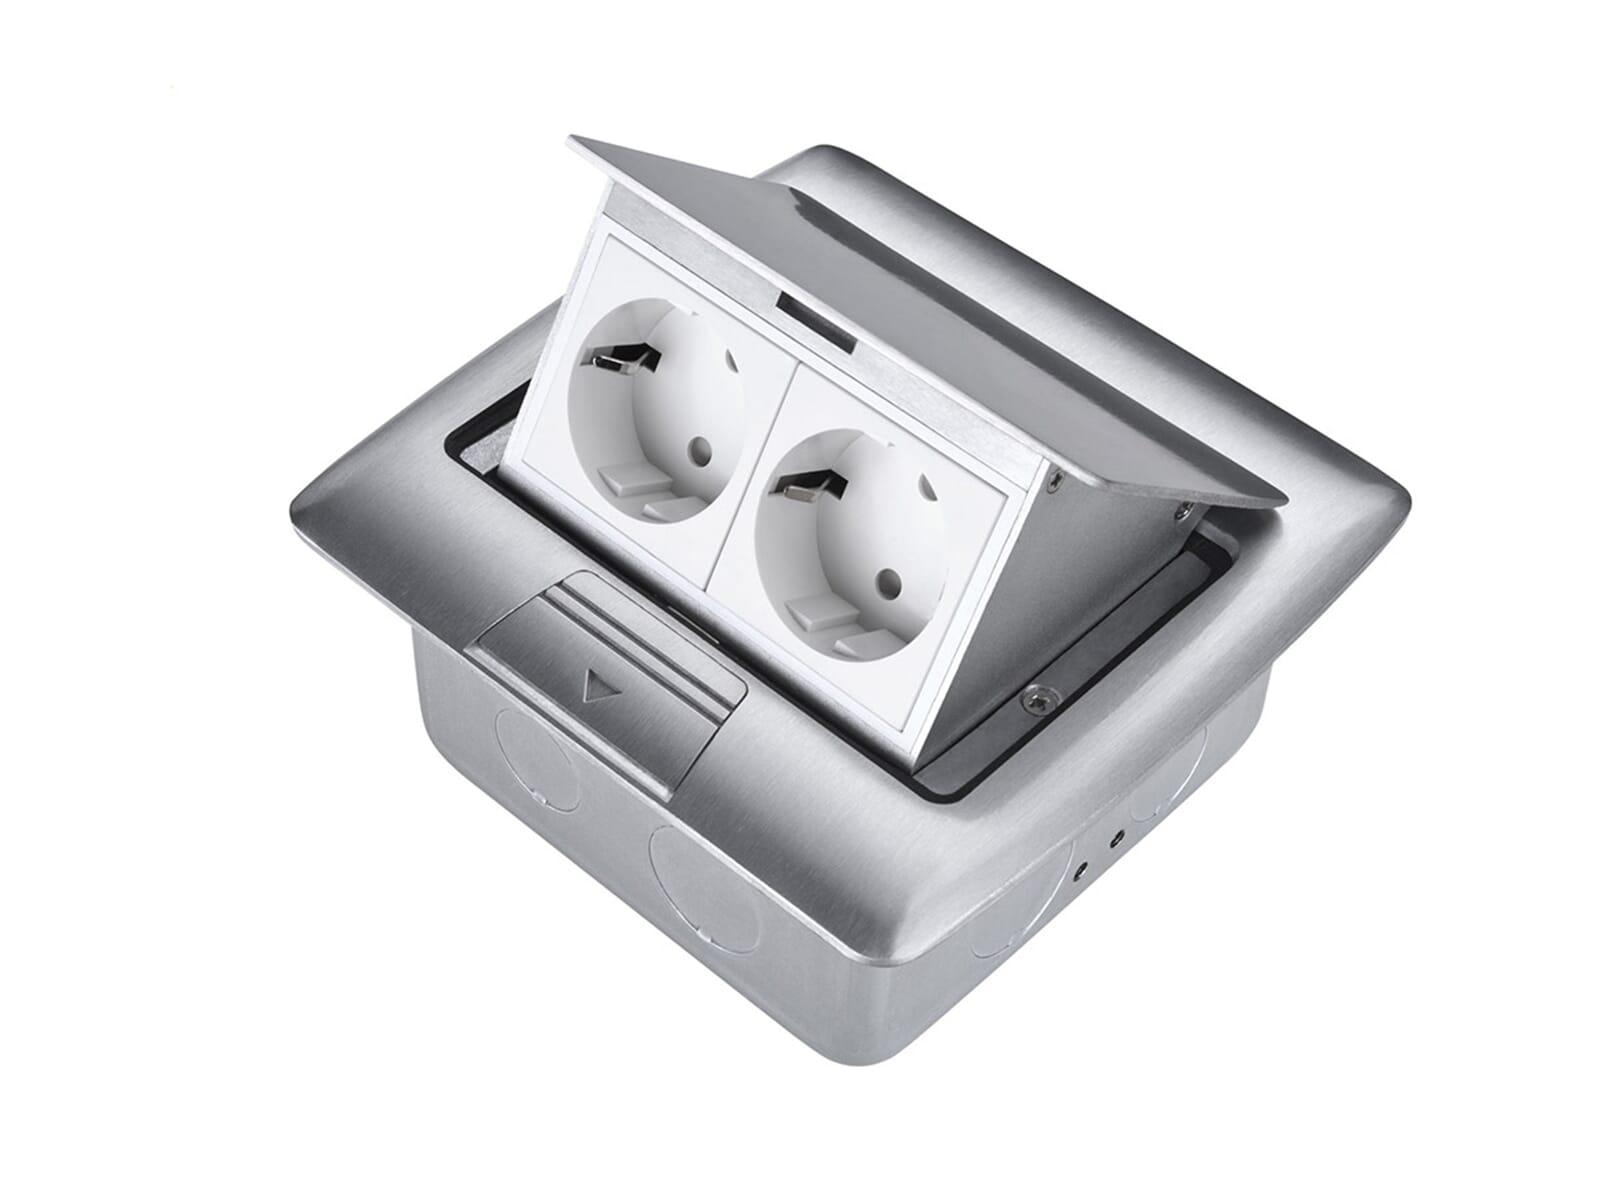 Thebo APS 13 - 17136S Tischsteckdose Aluminium